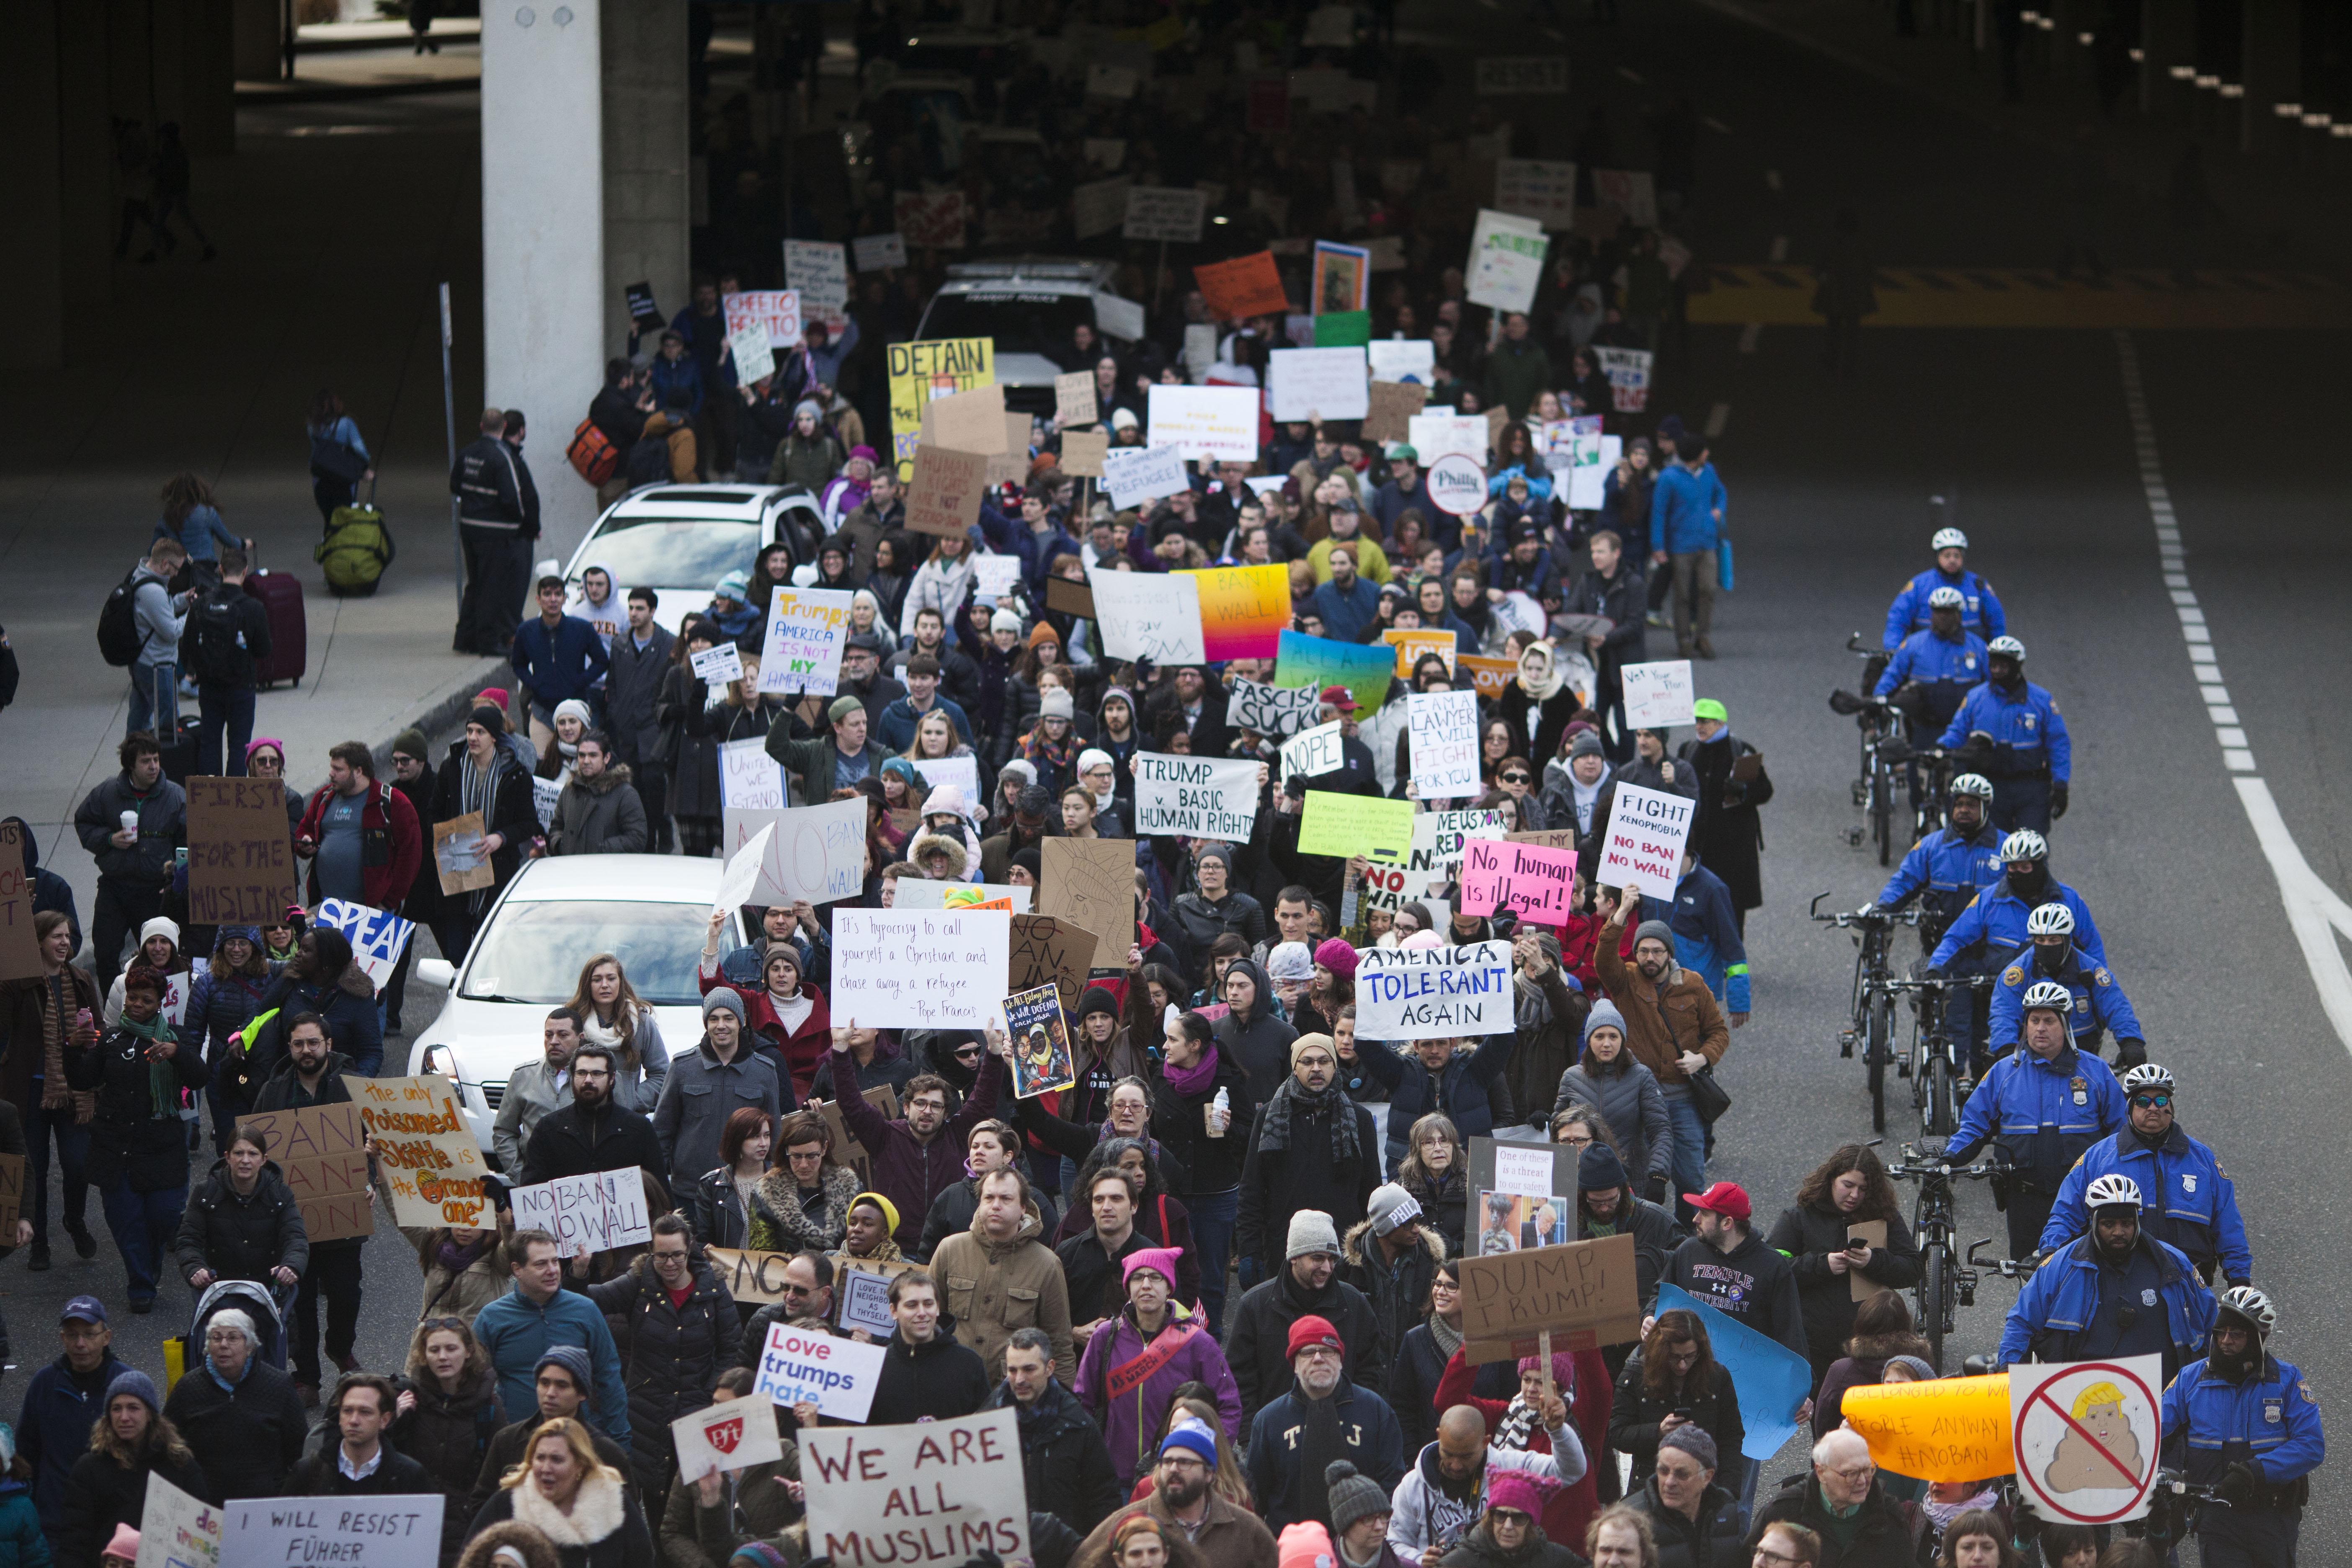 Protestors Rally At Philadelphia Airport Against Muslim Immigration Ban